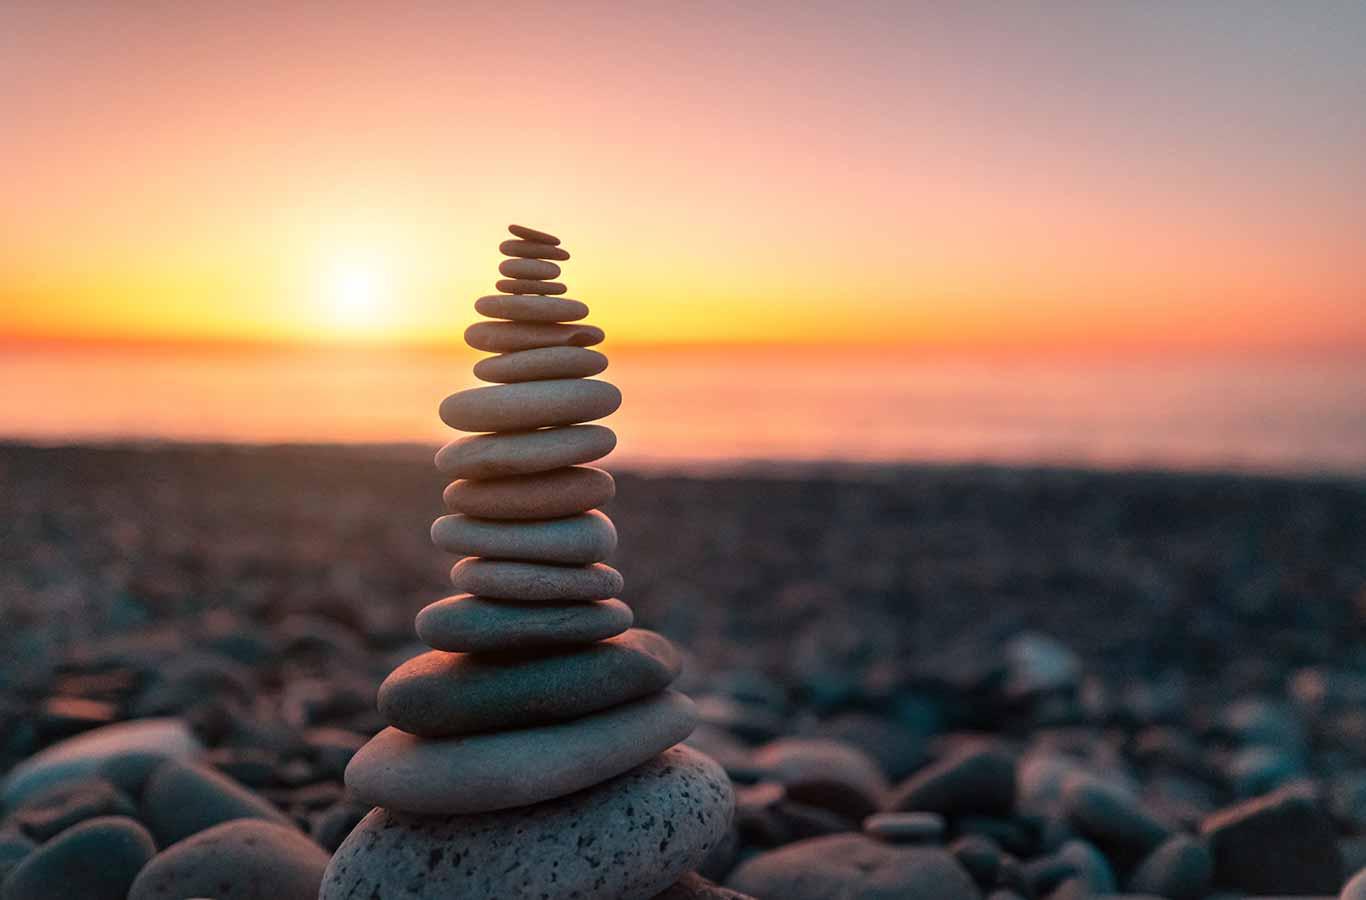 La practica del Kundalini Yoga estimula la creatividad